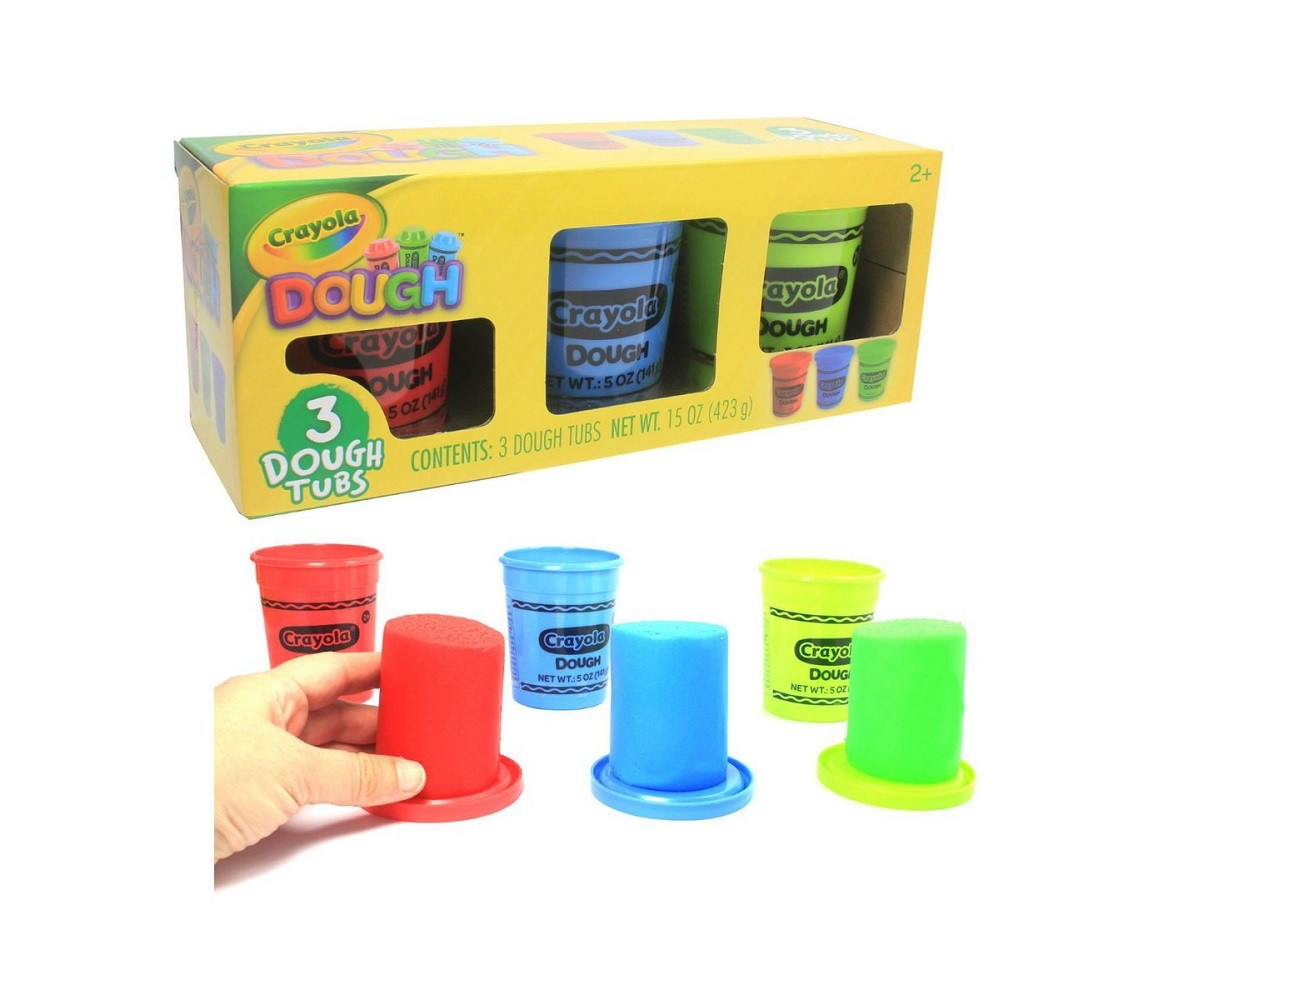 Massa de Modelar Crayola 423 gramas 3 cores Multikids BR1008  - Mix Eletro